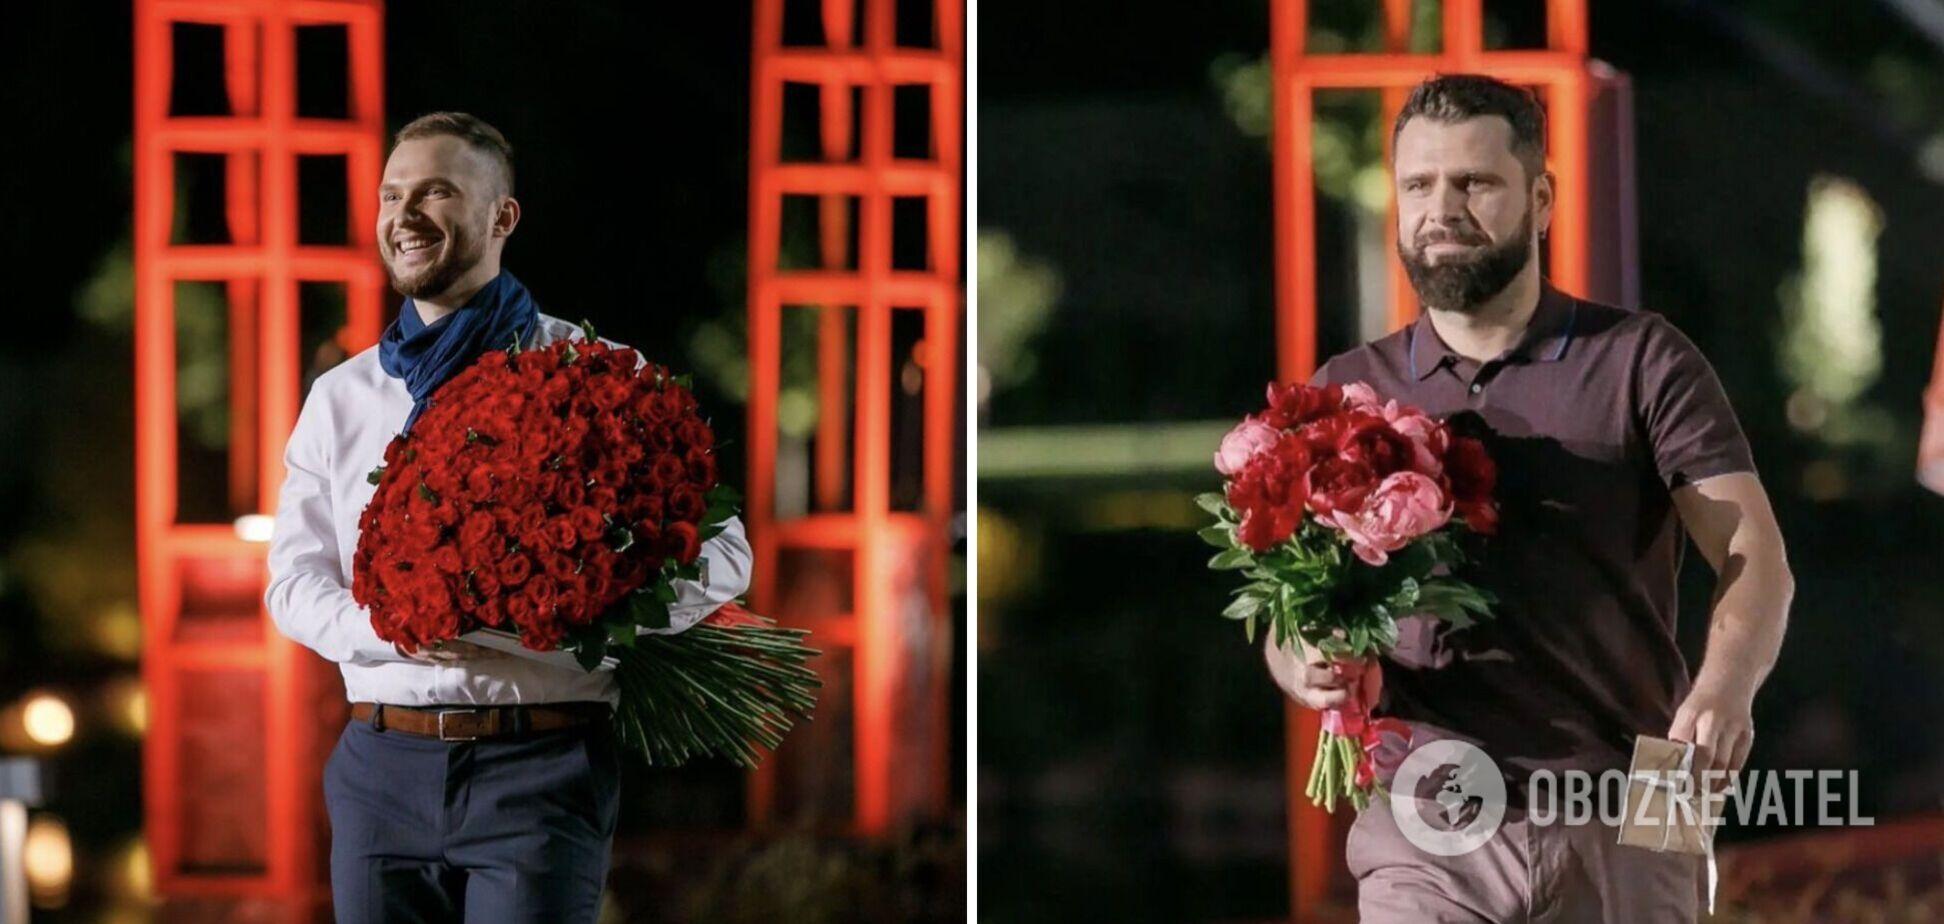 Участники покинули шоу 'Холостячка-2' во втором эпизоде